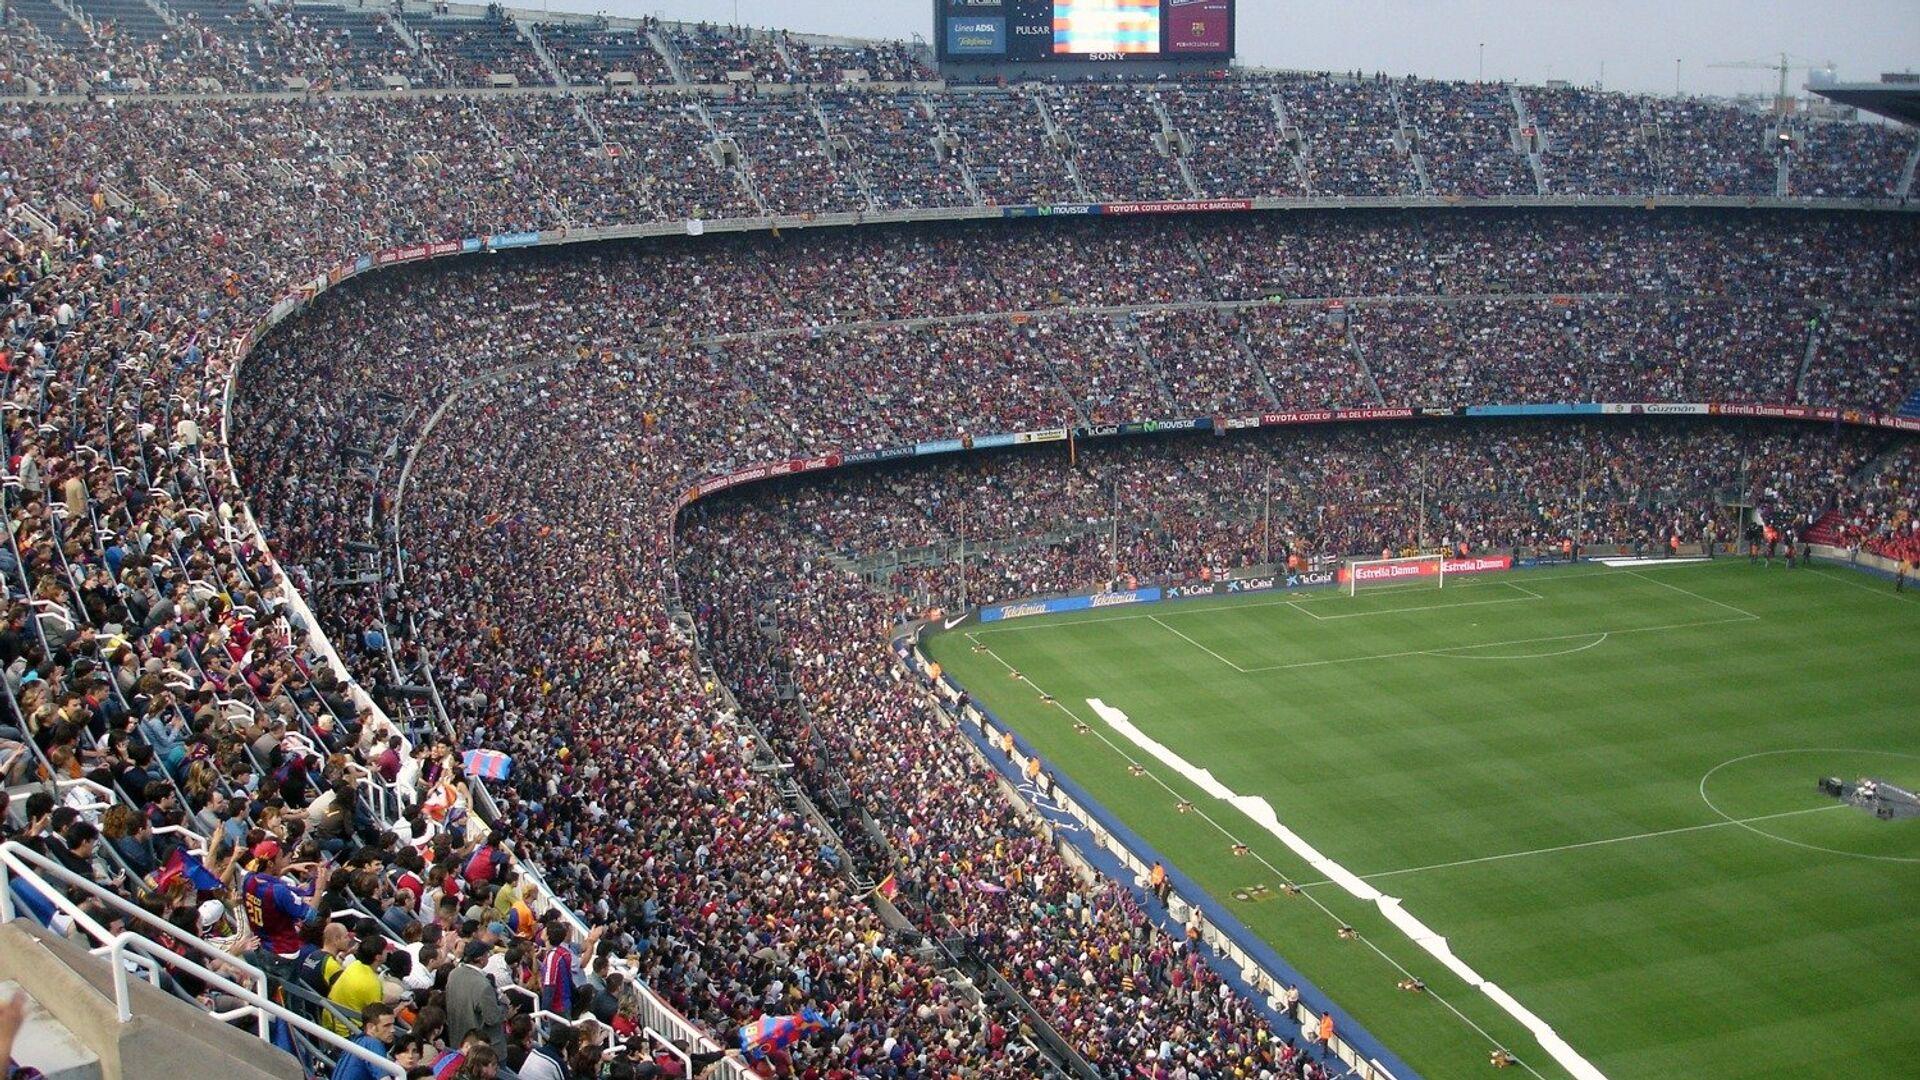 El estadio Camp Nou - Sputnik Mundo, 1920, 24.06.2021